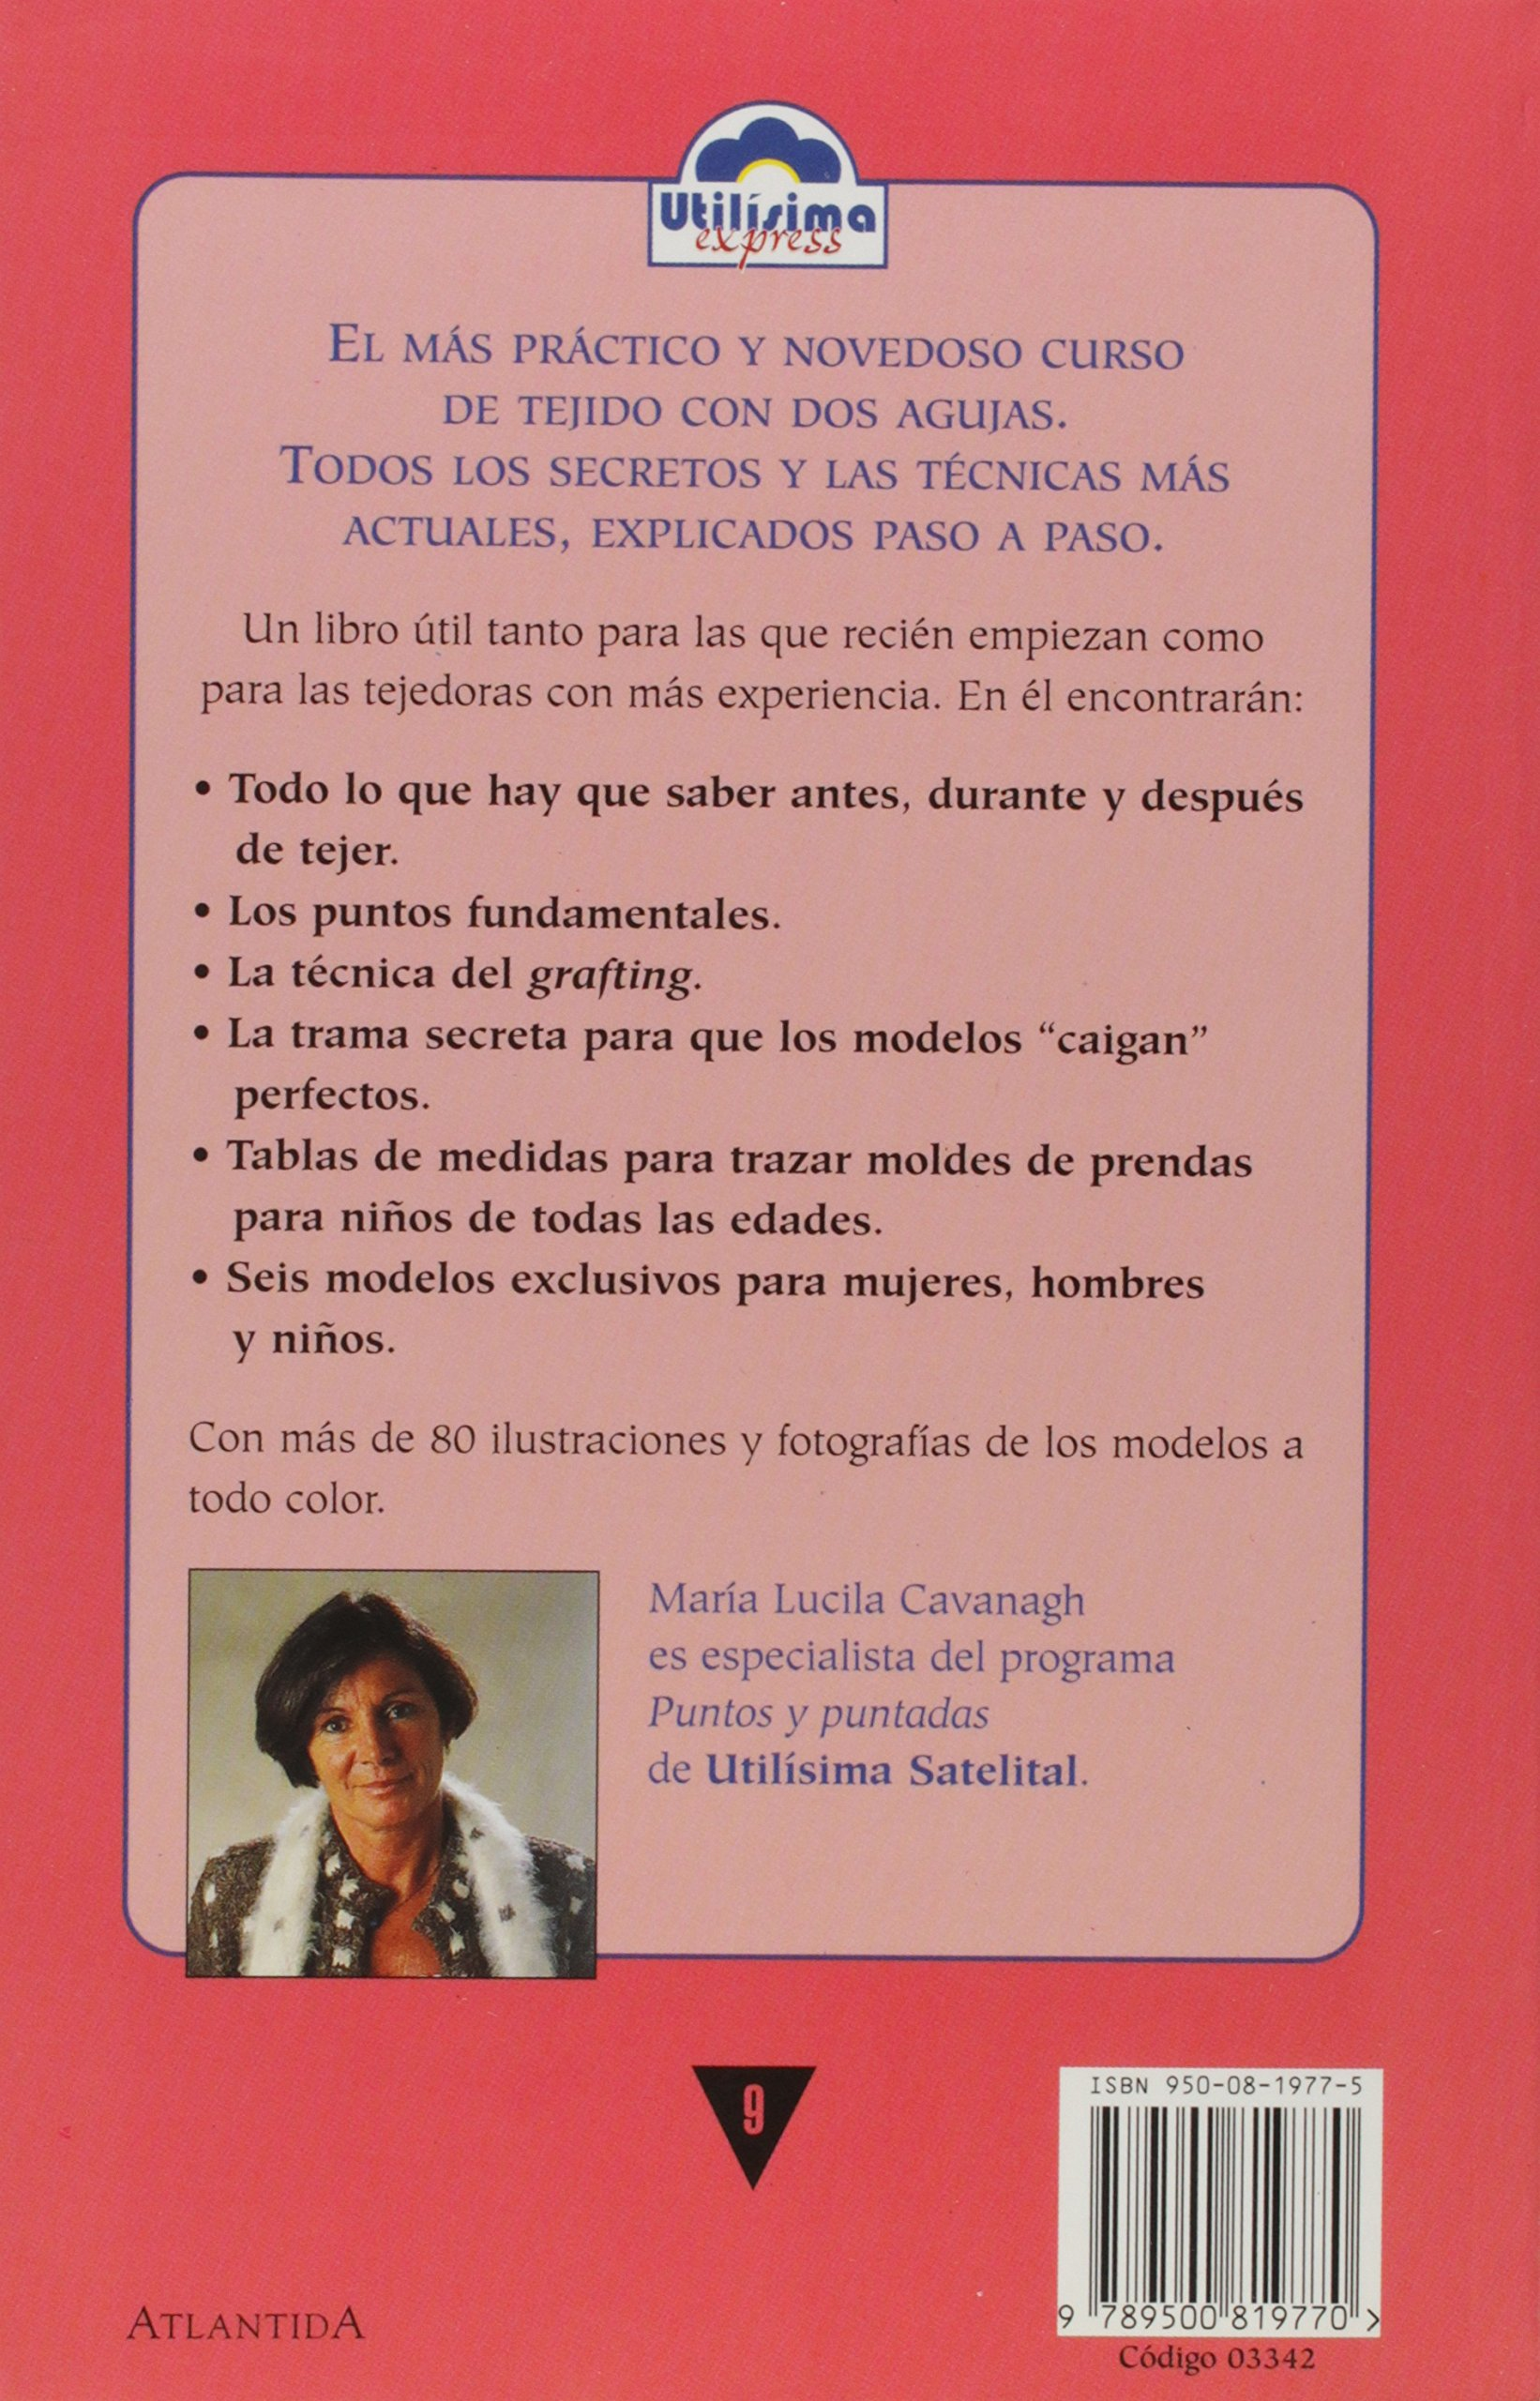 Curso práctico de tejido: Maria Lucila Cavanagh: 9789500819770: Amazon.com: Books